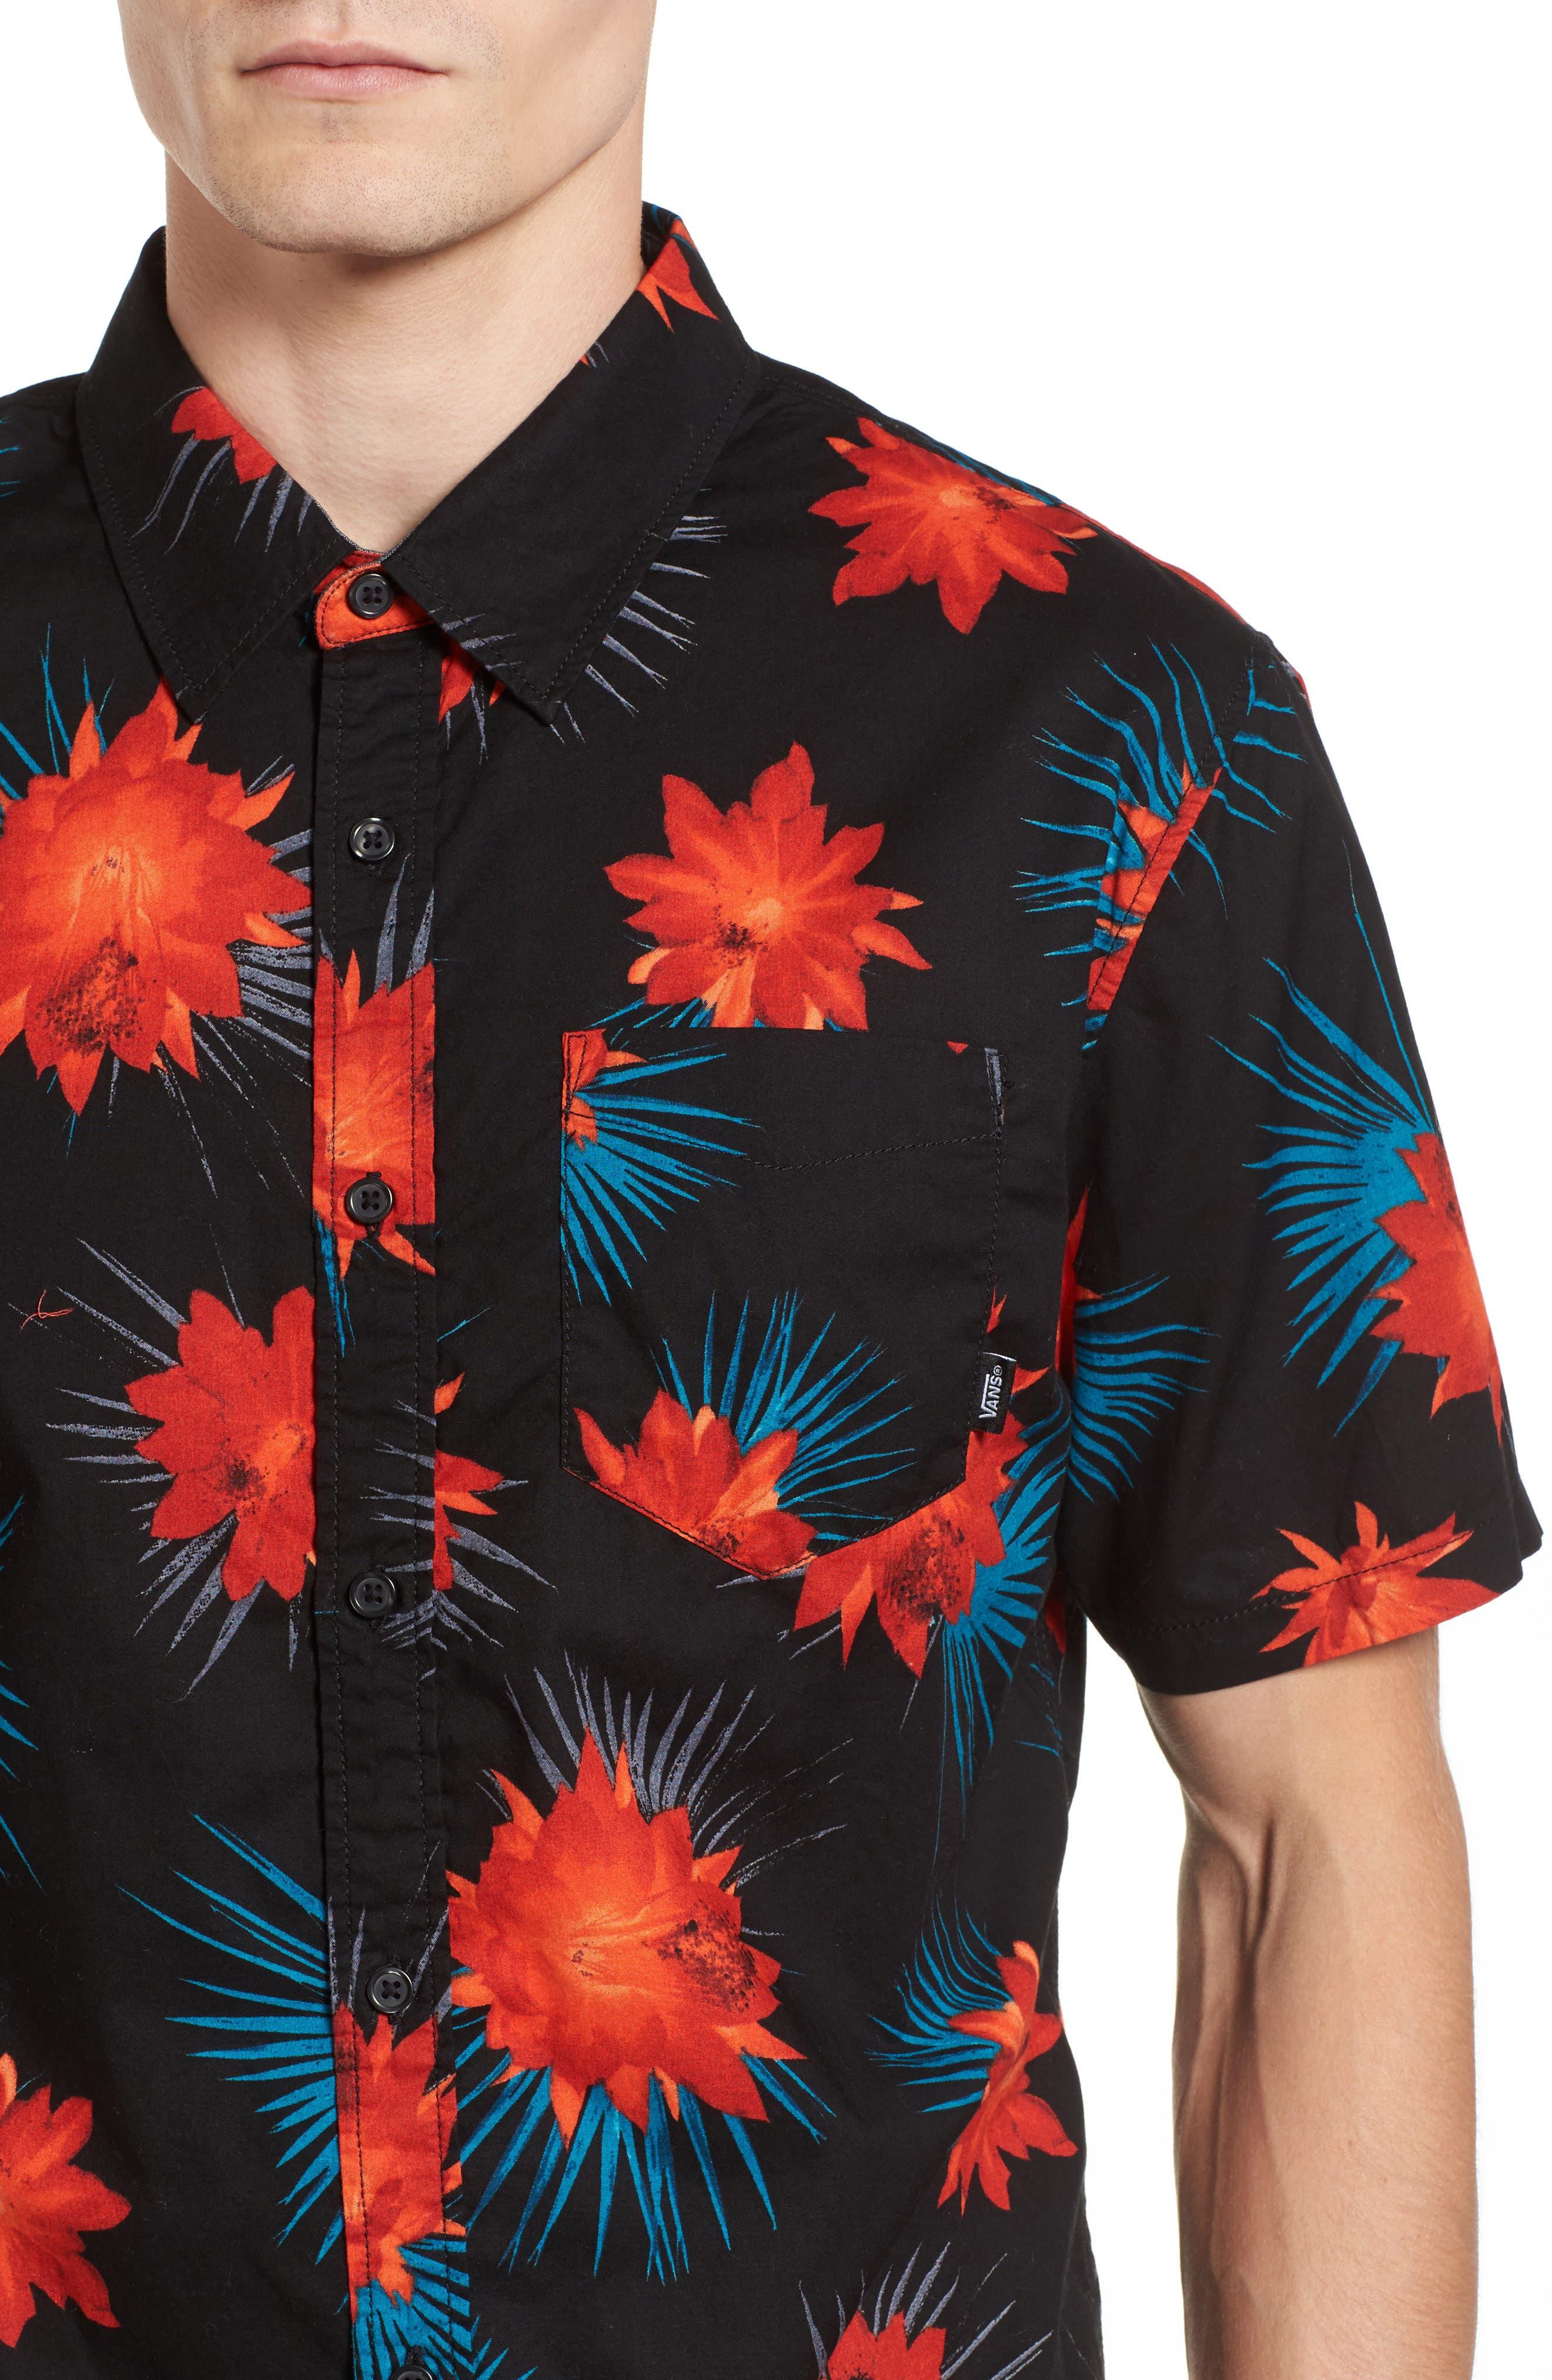 Cultivar Woven Shirt,                             Alternate thumbnail 4, color,                             001